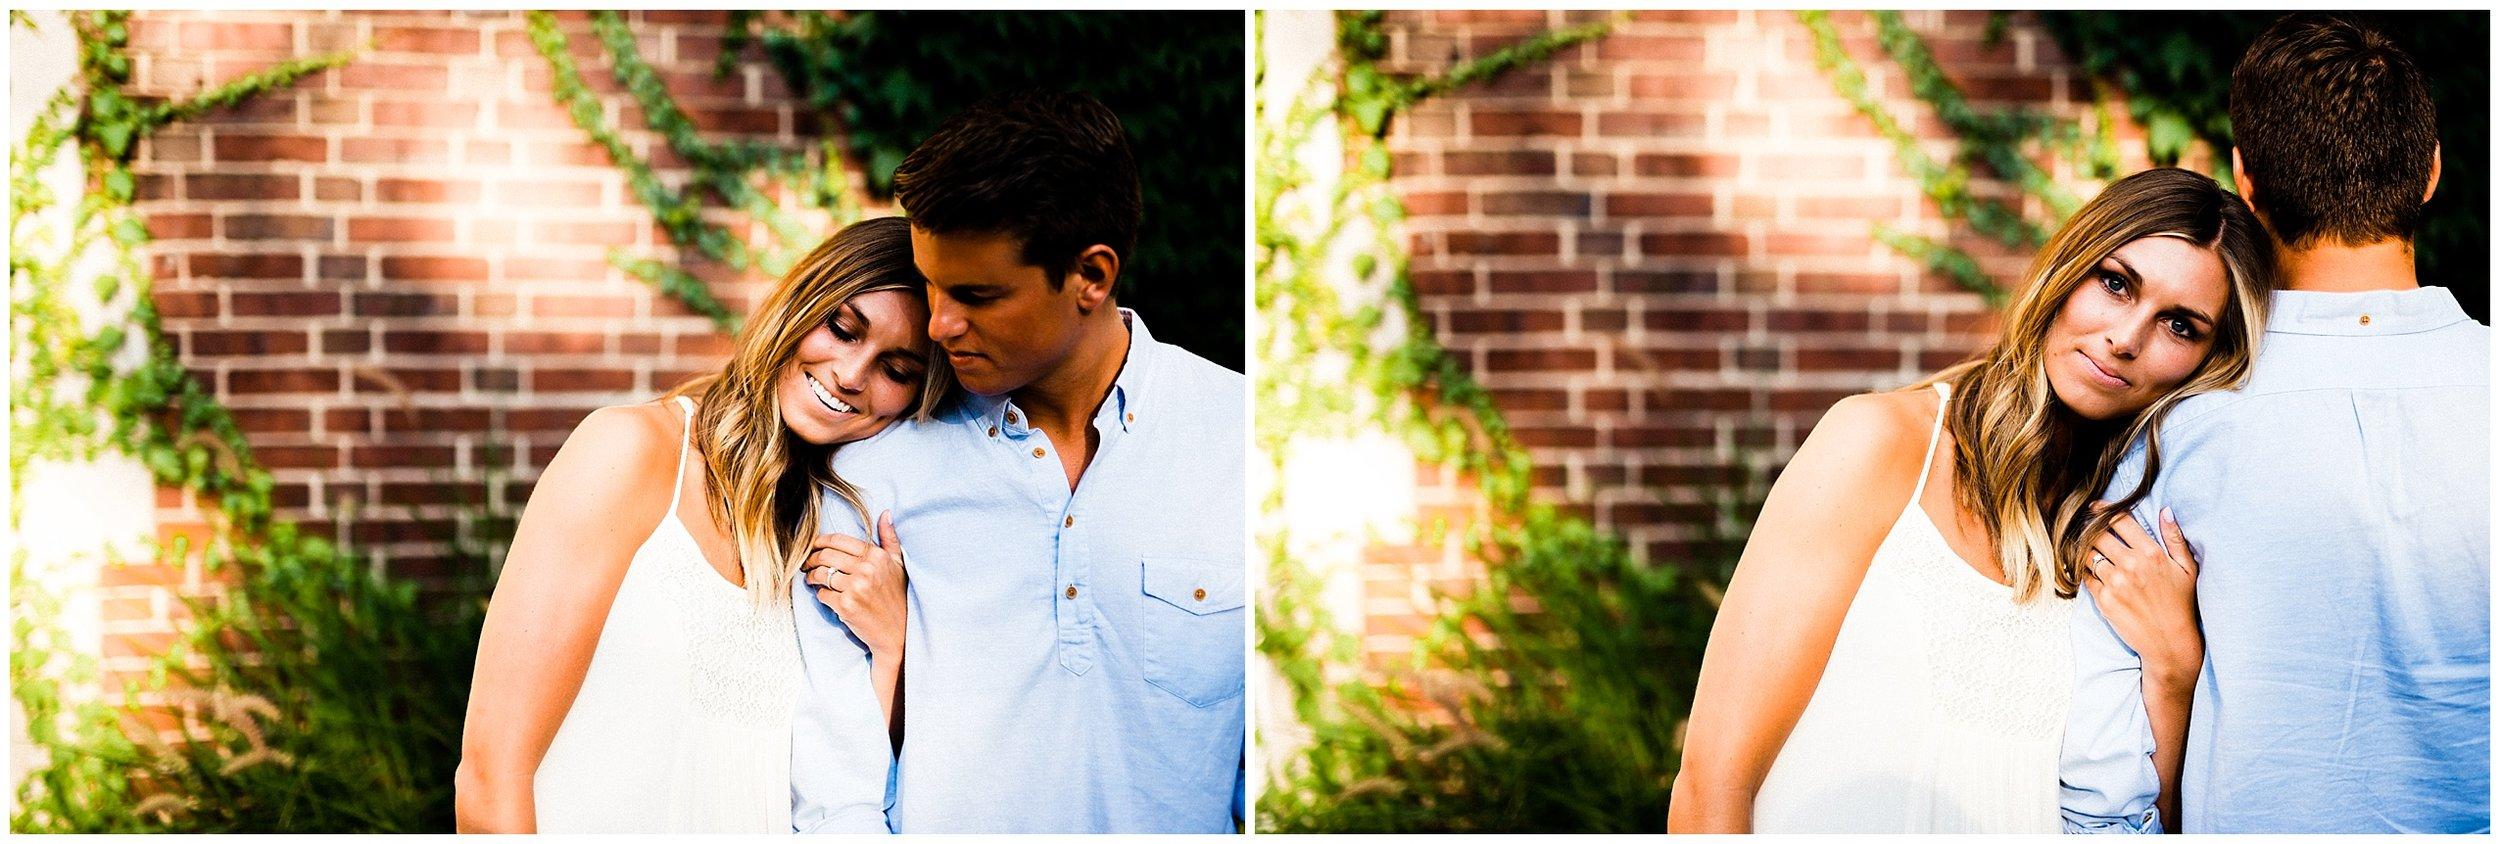 Kelsey + Josh   Engaged #kyleepaigephotography_0530.jpg